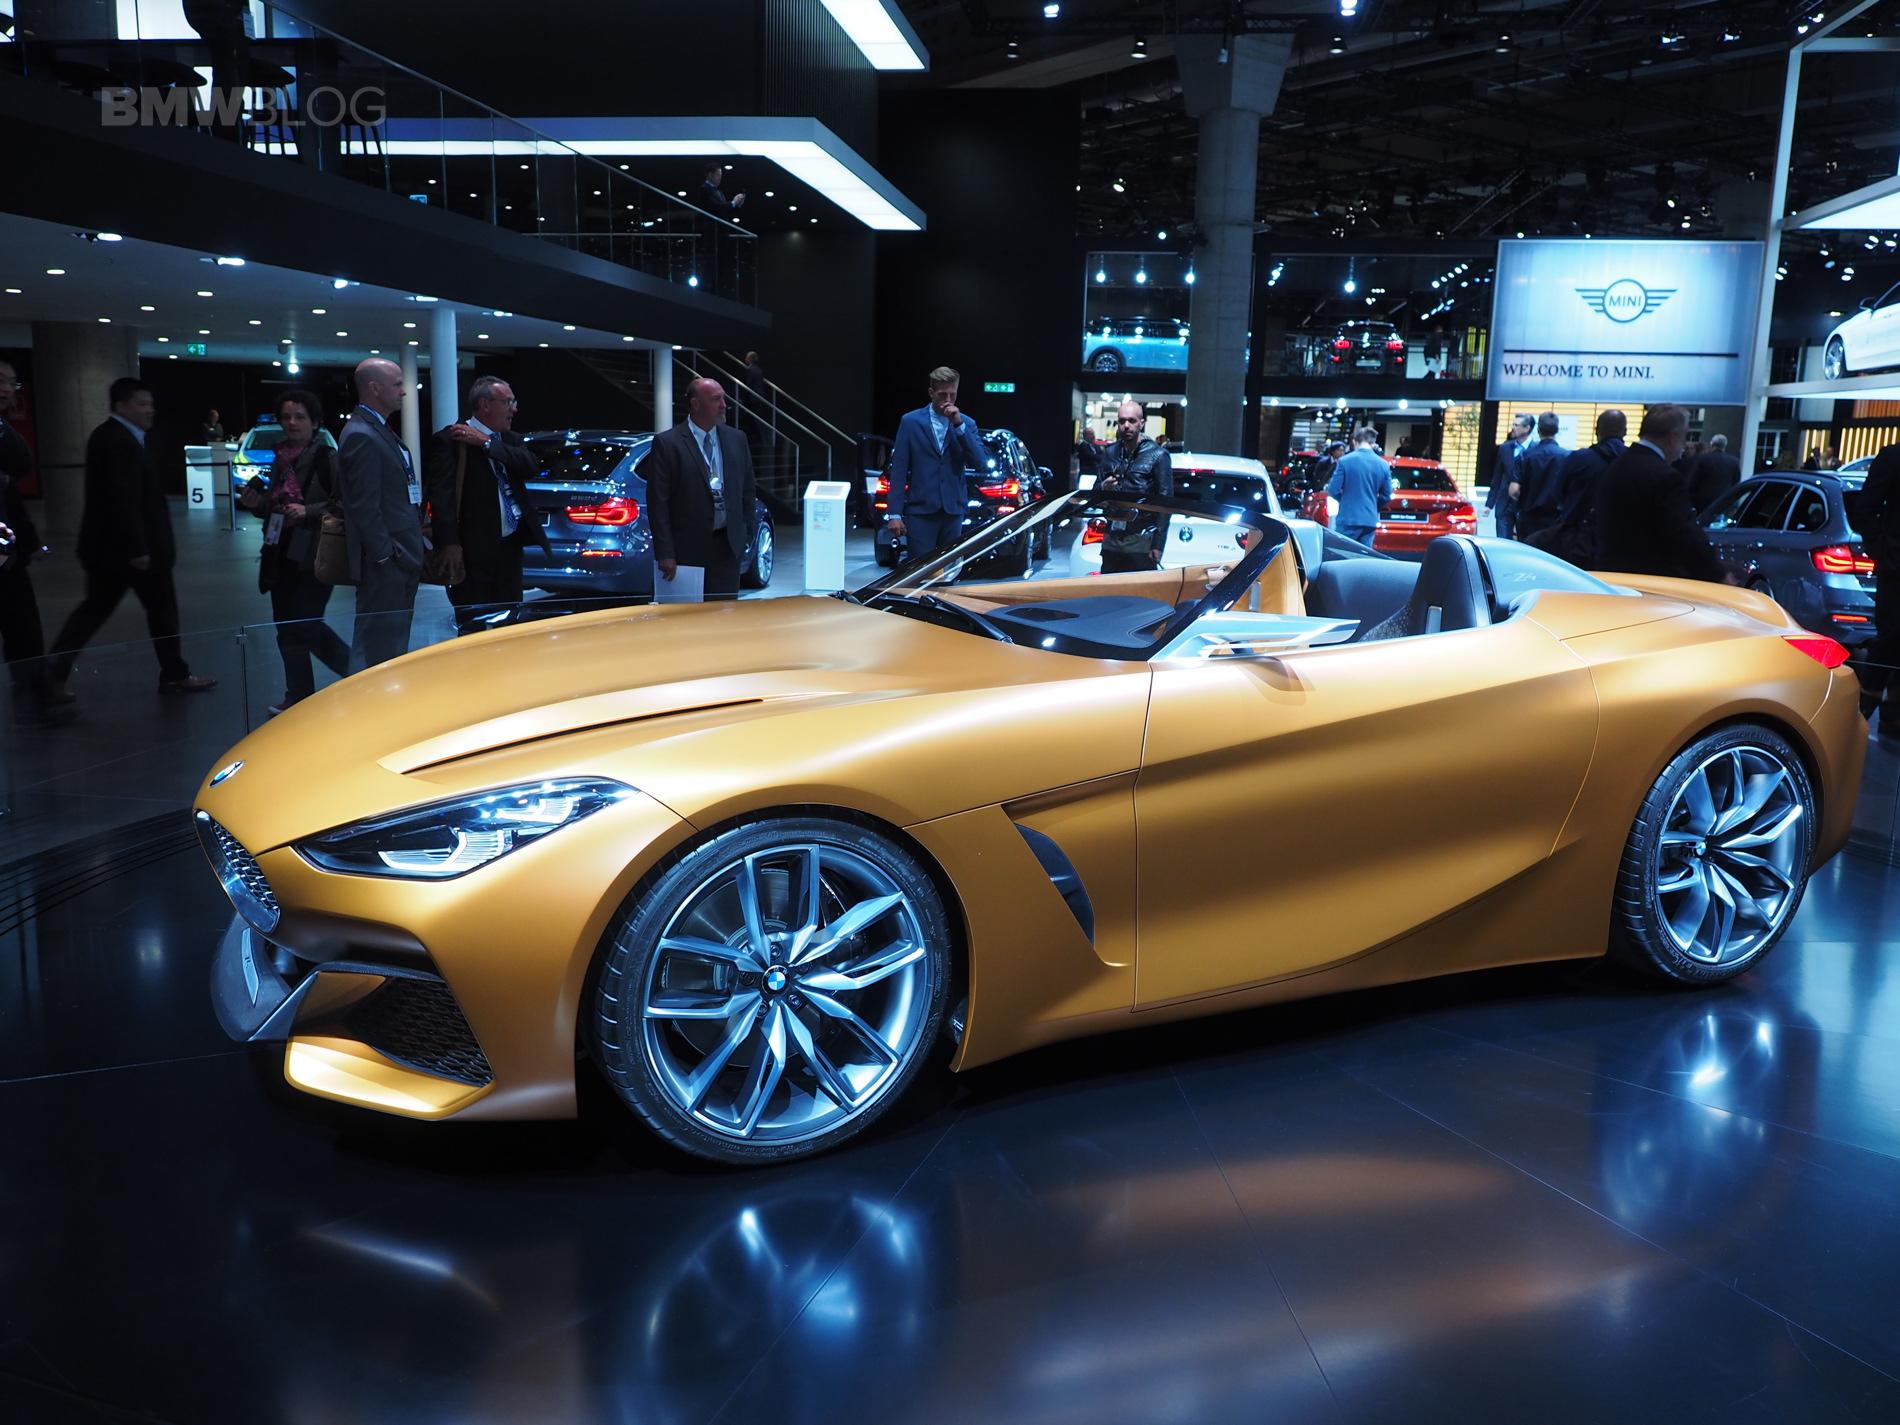 2017 frankfurt auto show: the new bmw concept z4 is a beauty